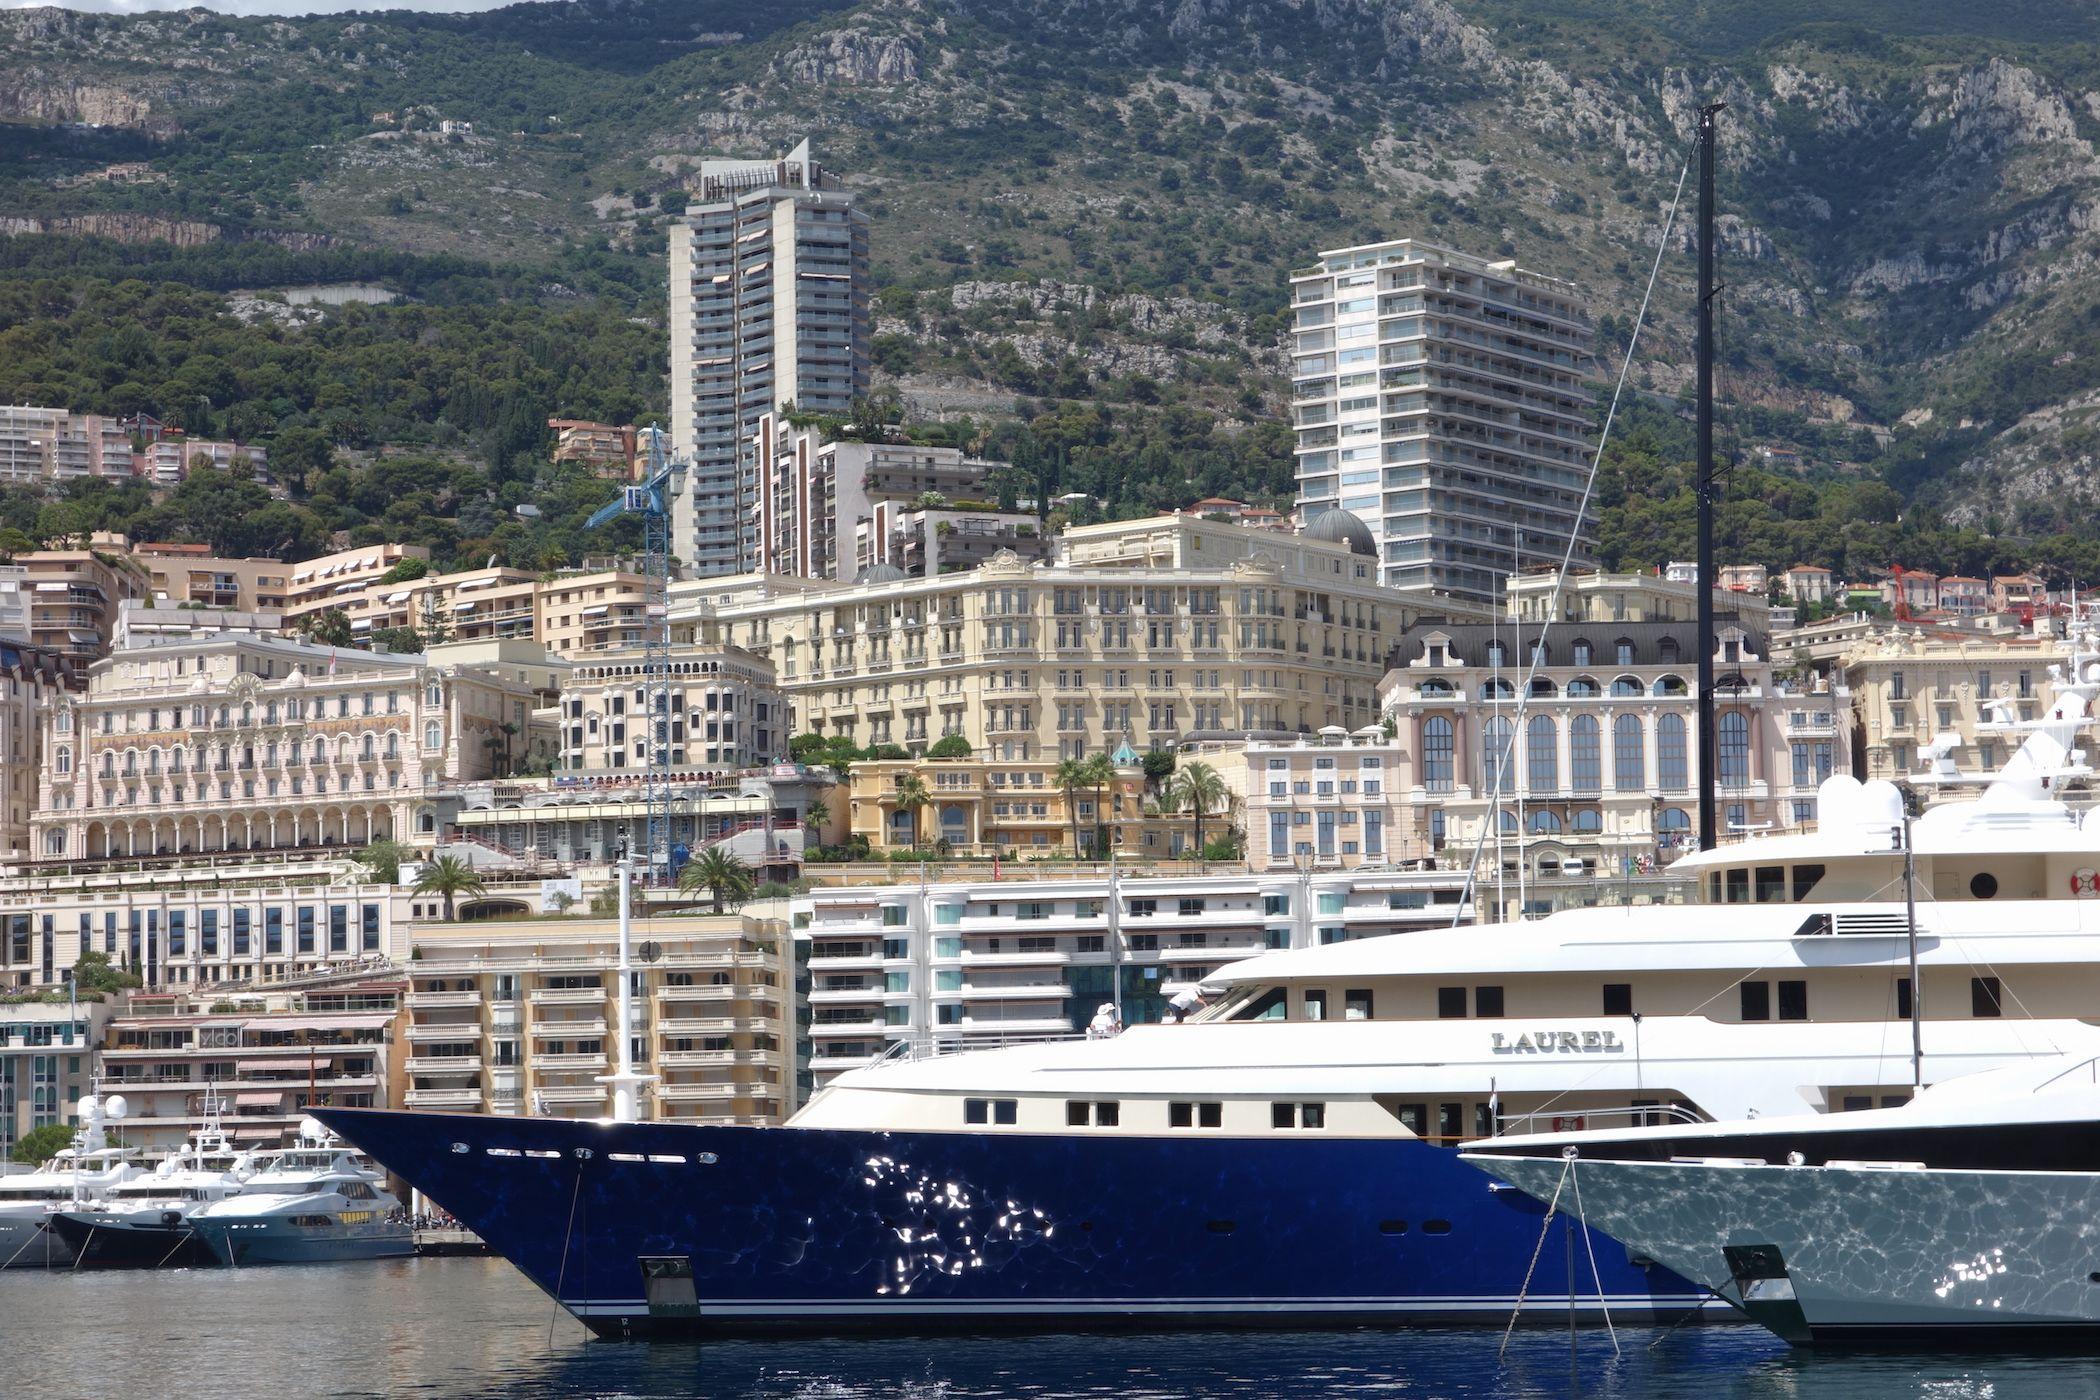 Promenade Durch Monaco Prunkvolle Yachten Teure Autos